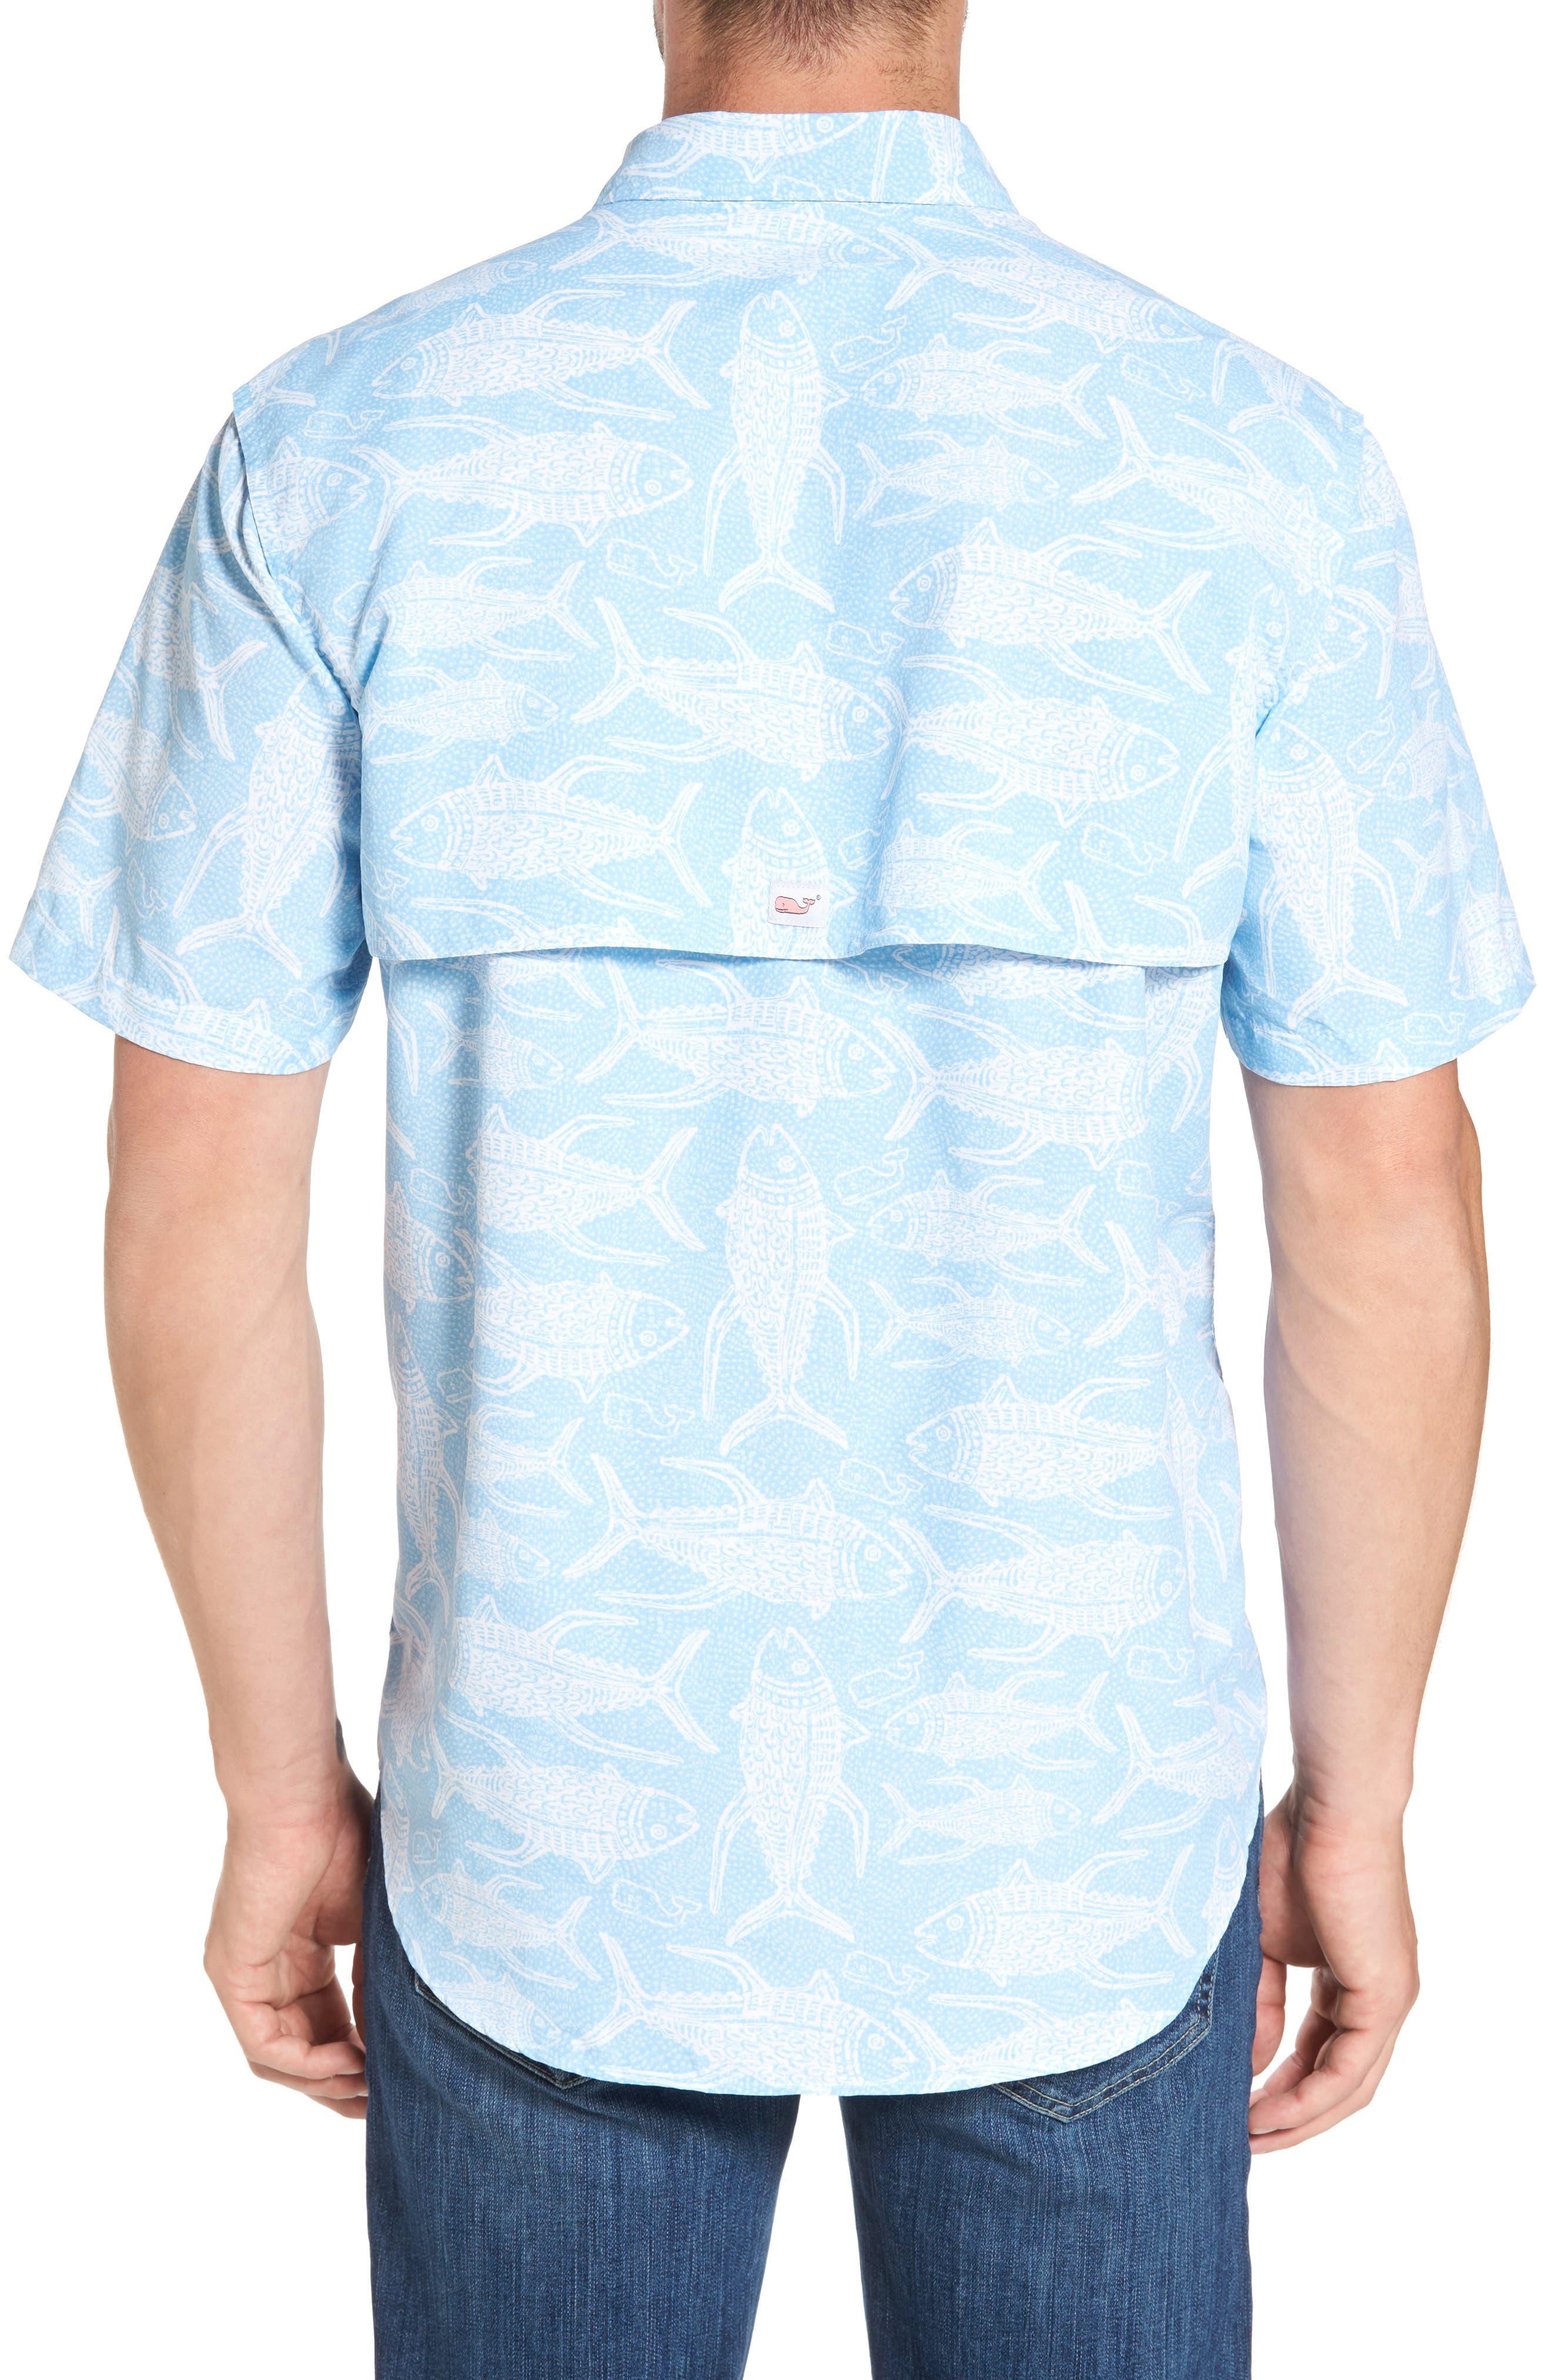 Alternate Image 2  - Vineyard Vines Tuna Batic Harbor Short Sleeve Sport Shirt